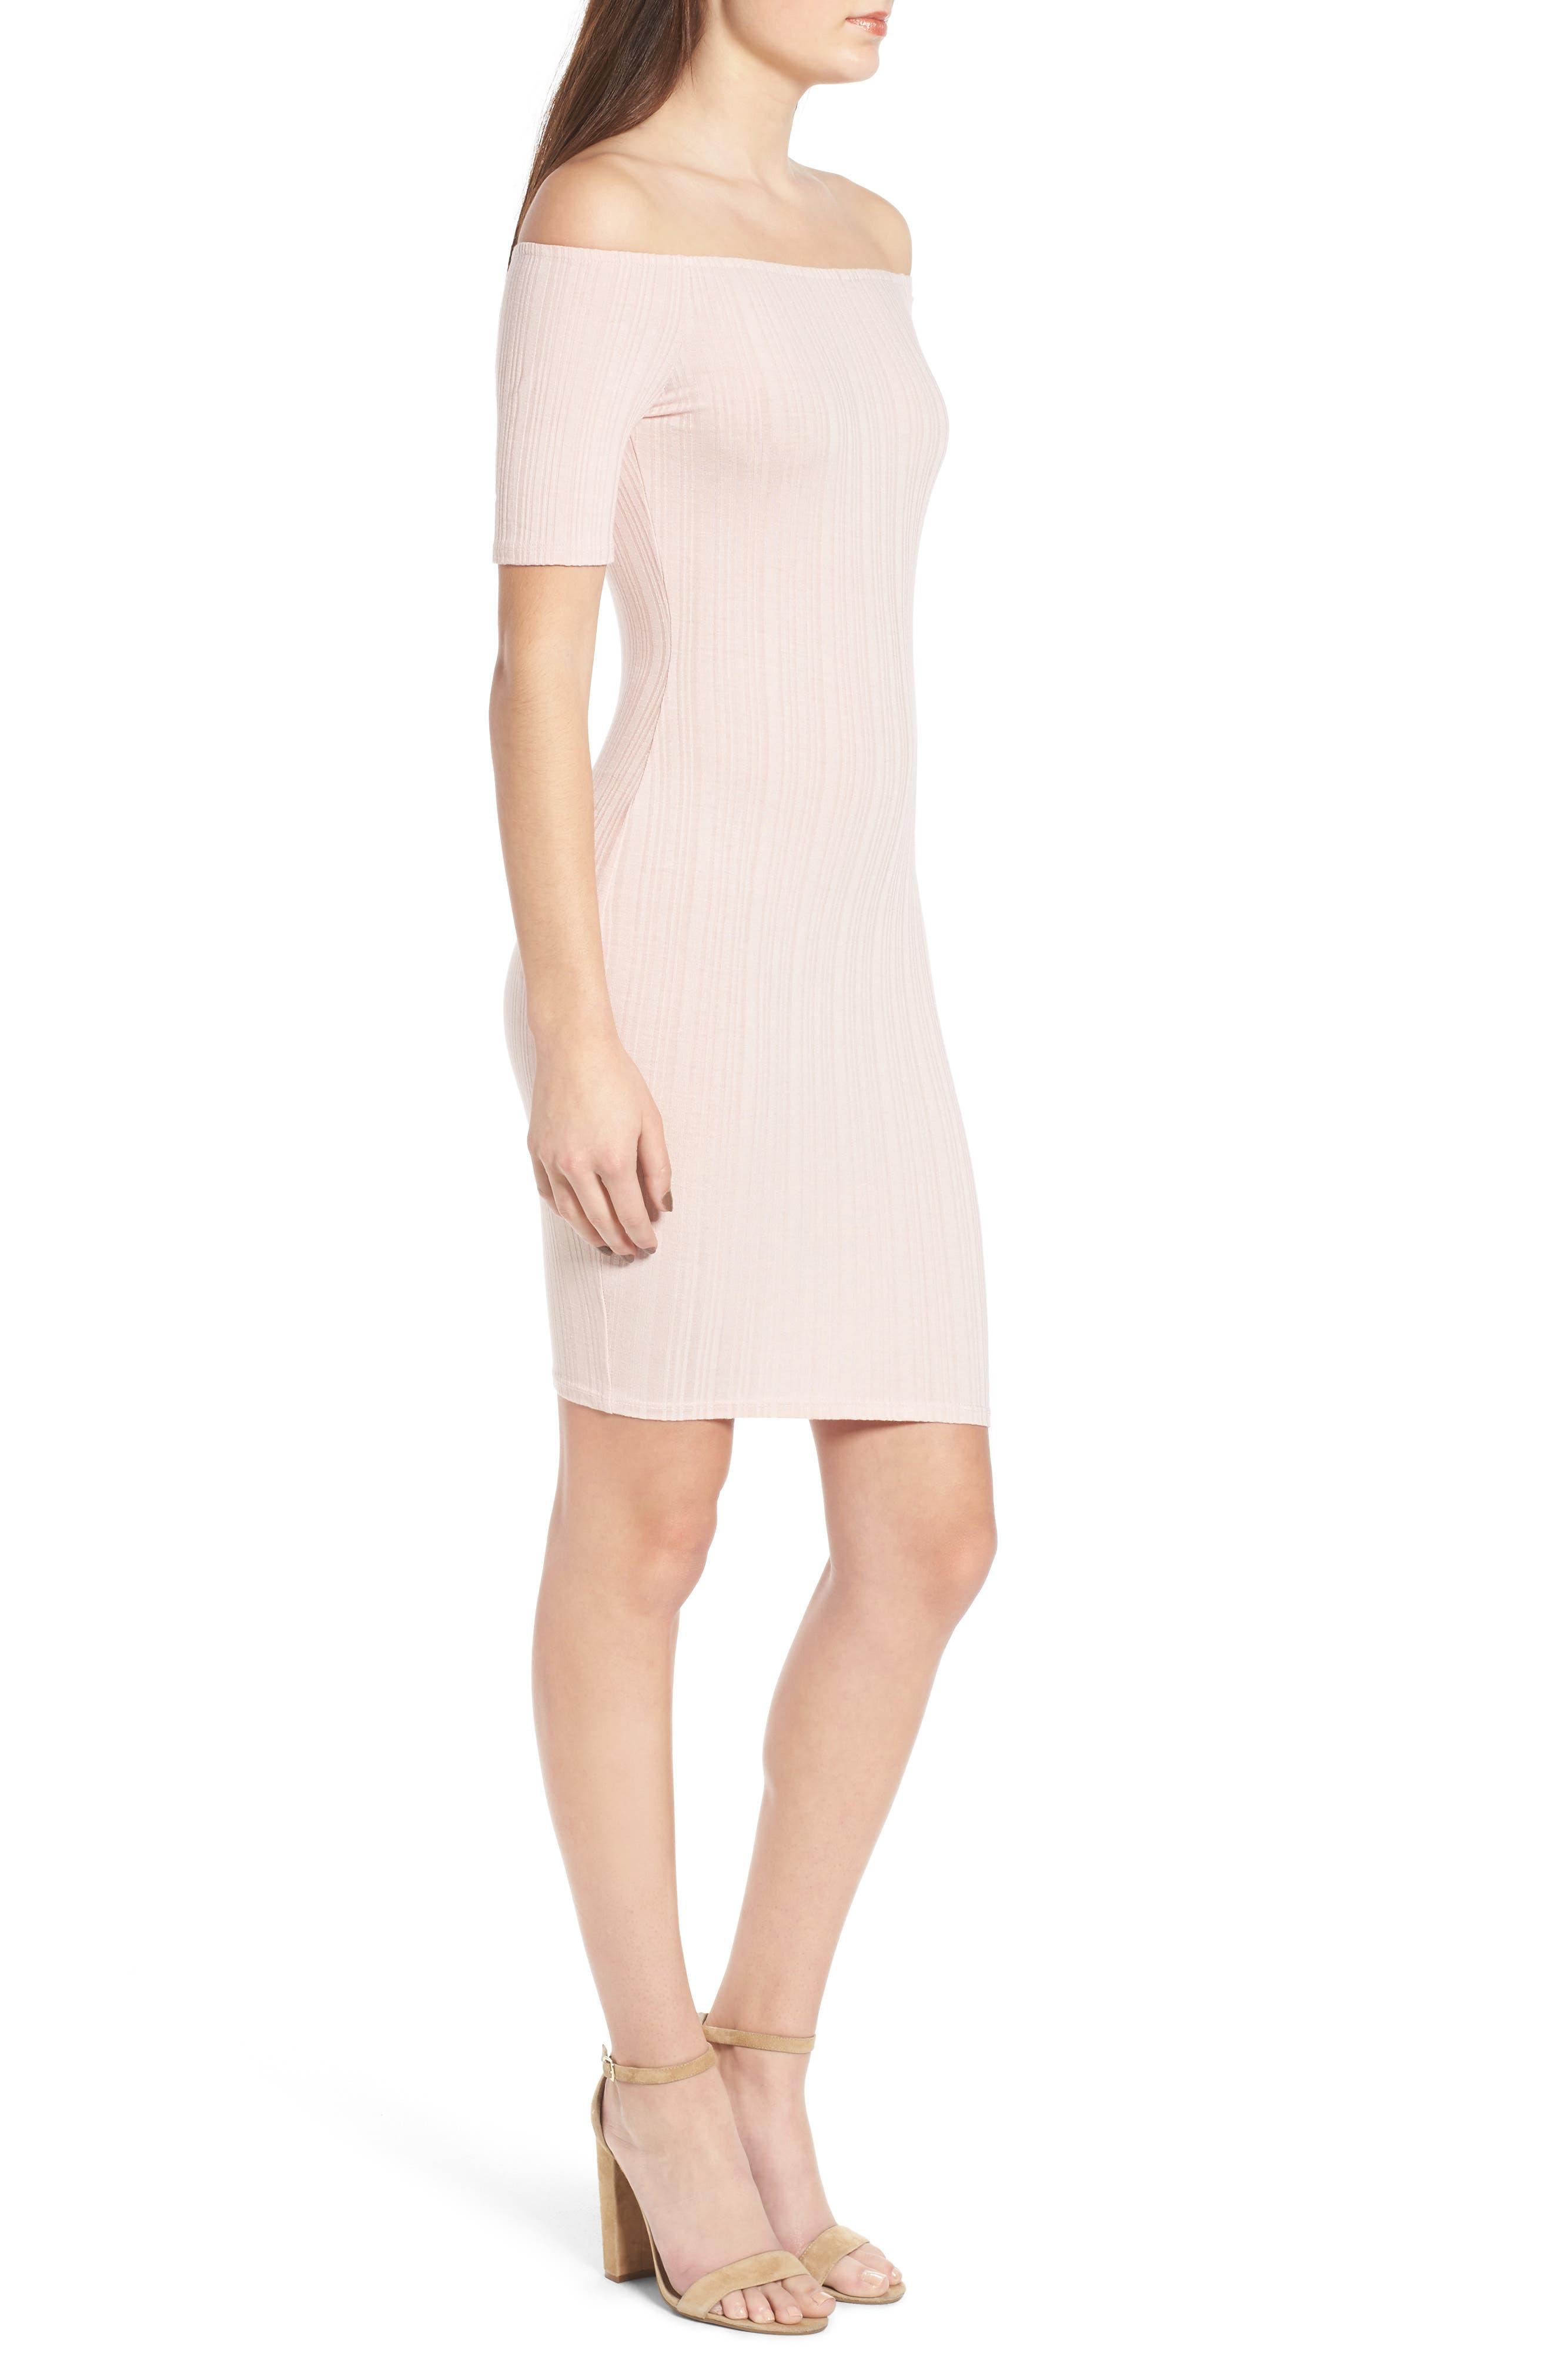 Alternate Image 3  - Michelle by Comune Bellmead Off-the-Shoulder Dress